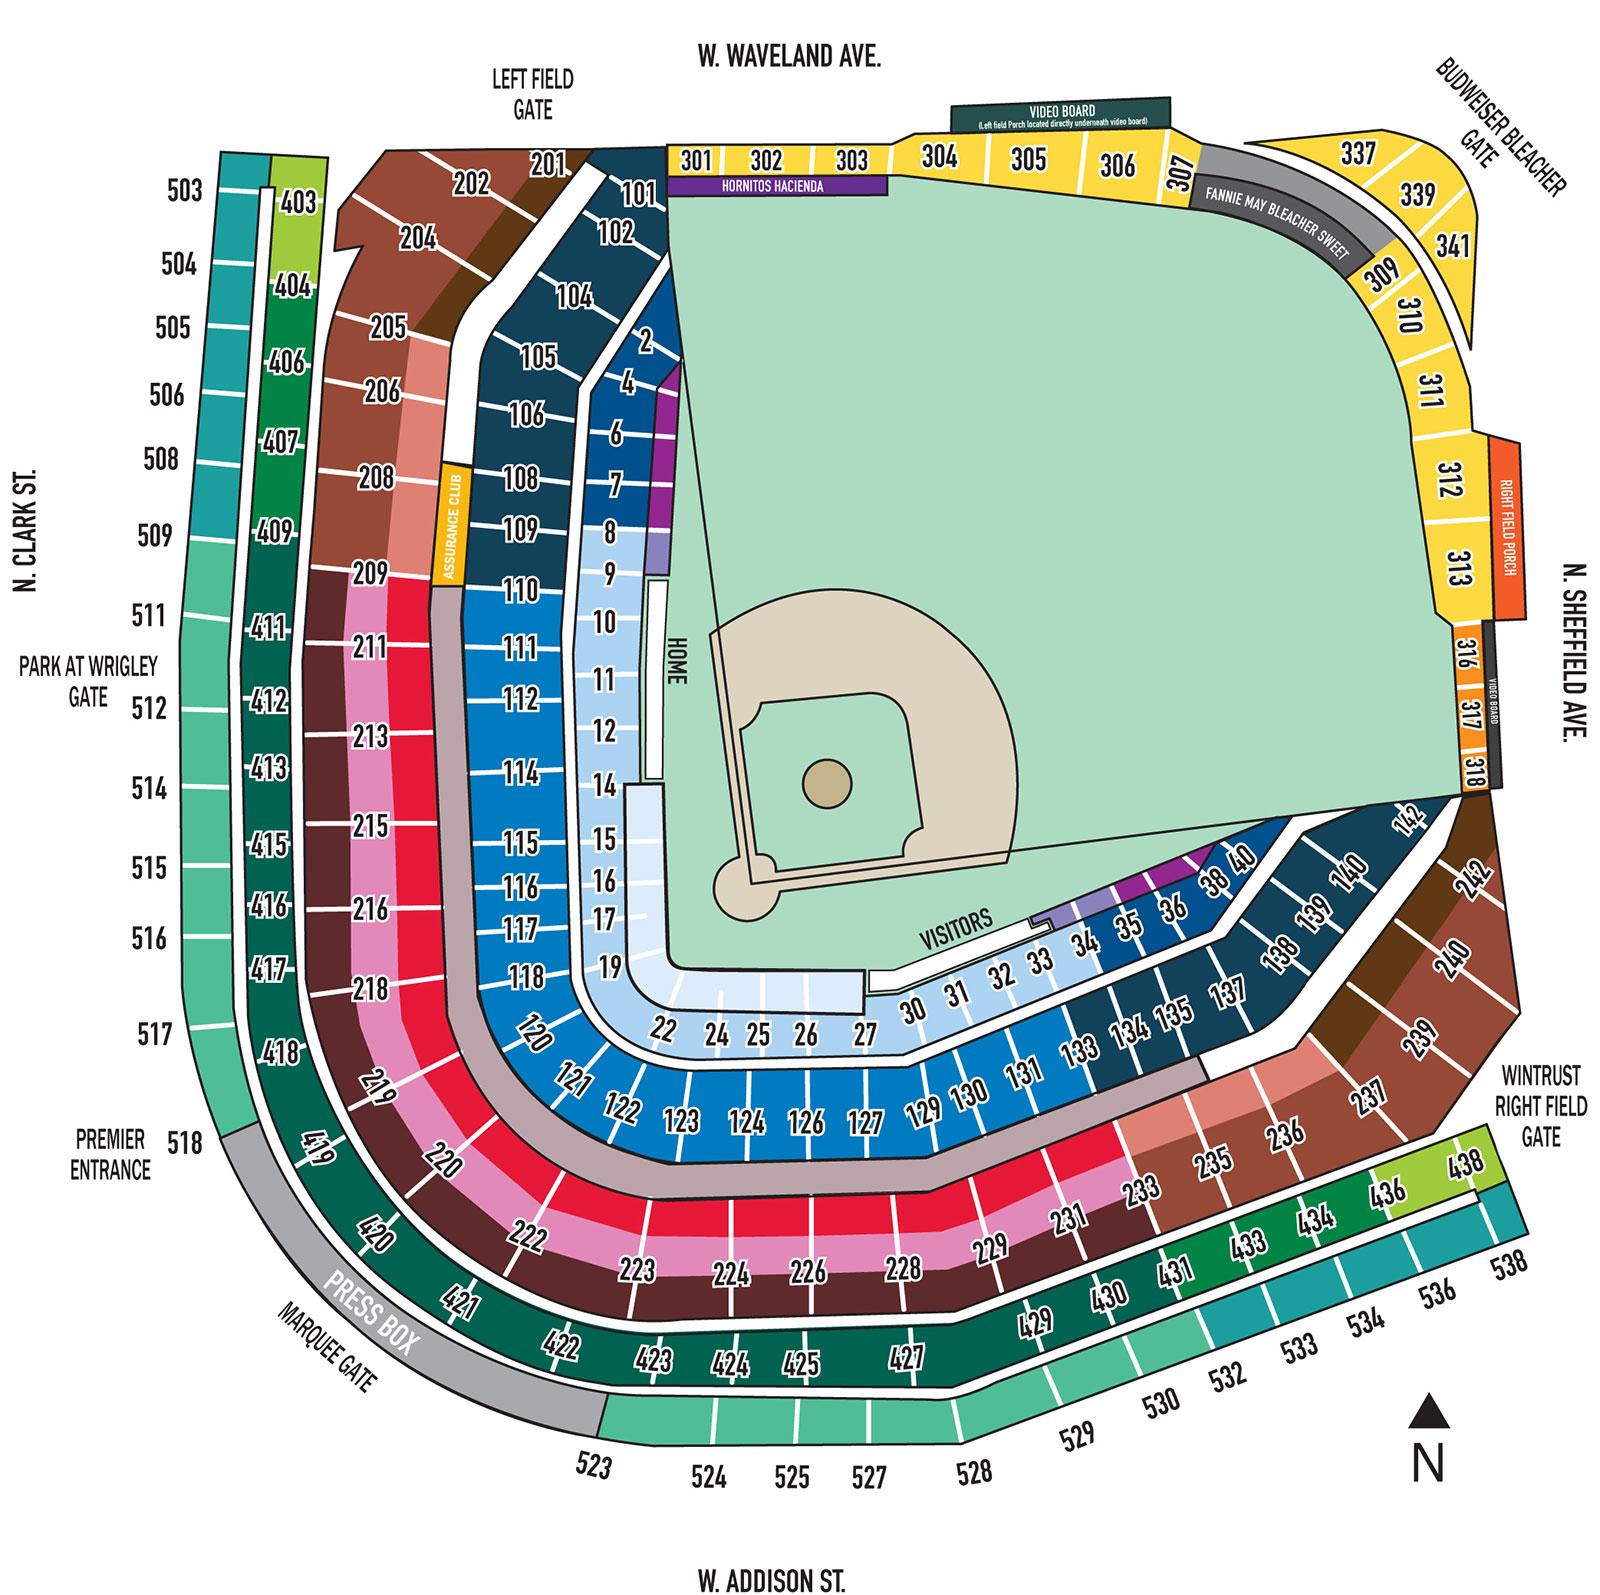 Chicago Subway Map Wrigley Field.Wrigley Field Mlb Stadium Guide